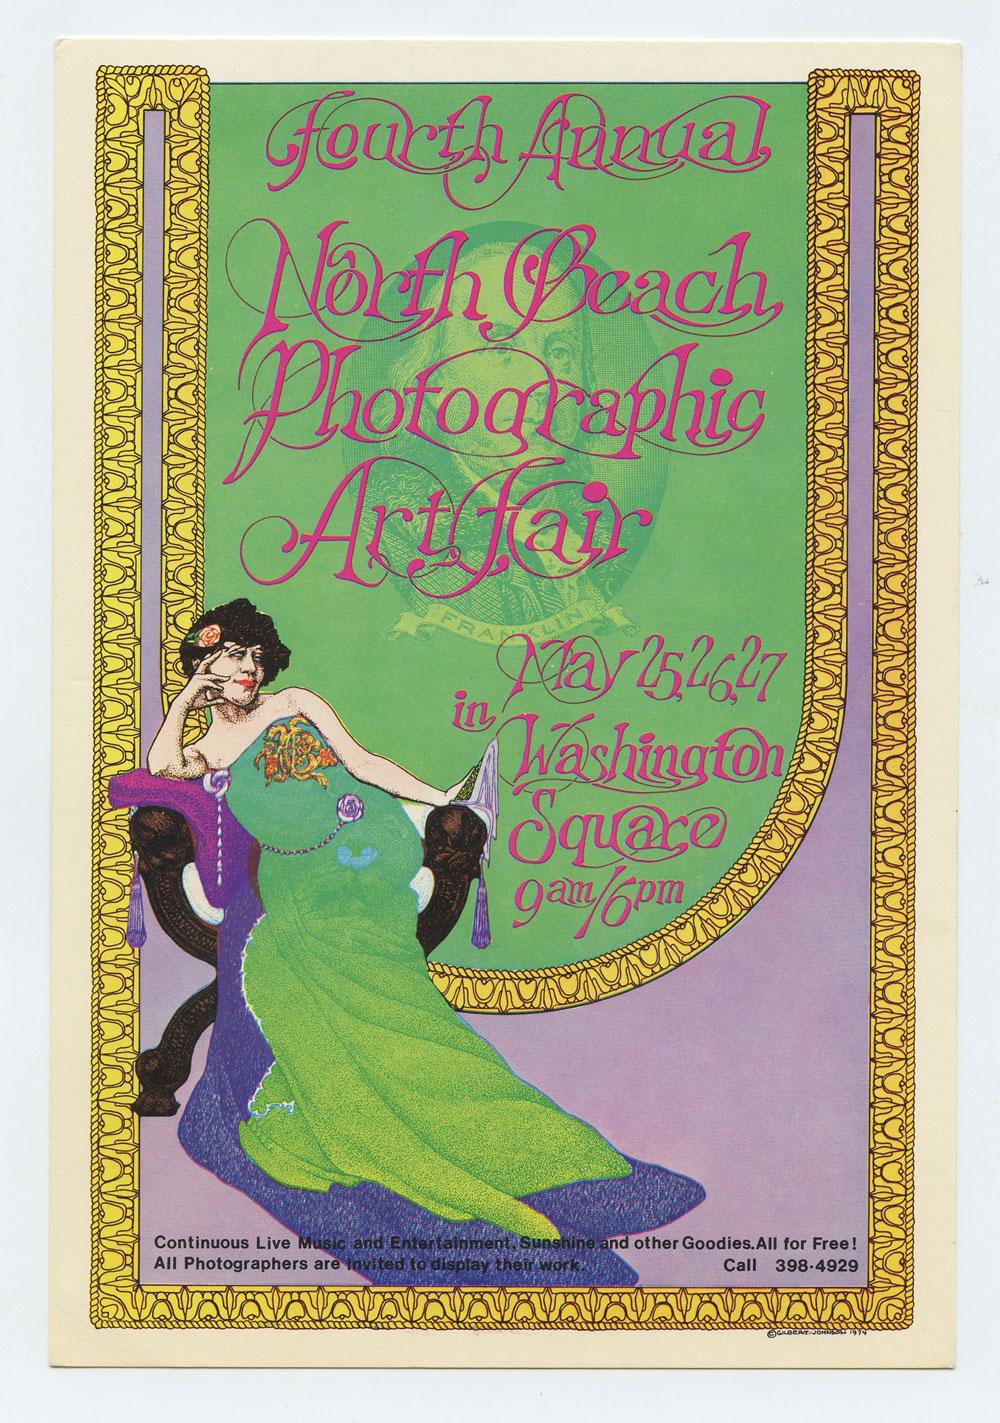 North Beach Photographic Art Fair Handbill 1974 May 25 Washington Square San Francisco Gilbert Johnson